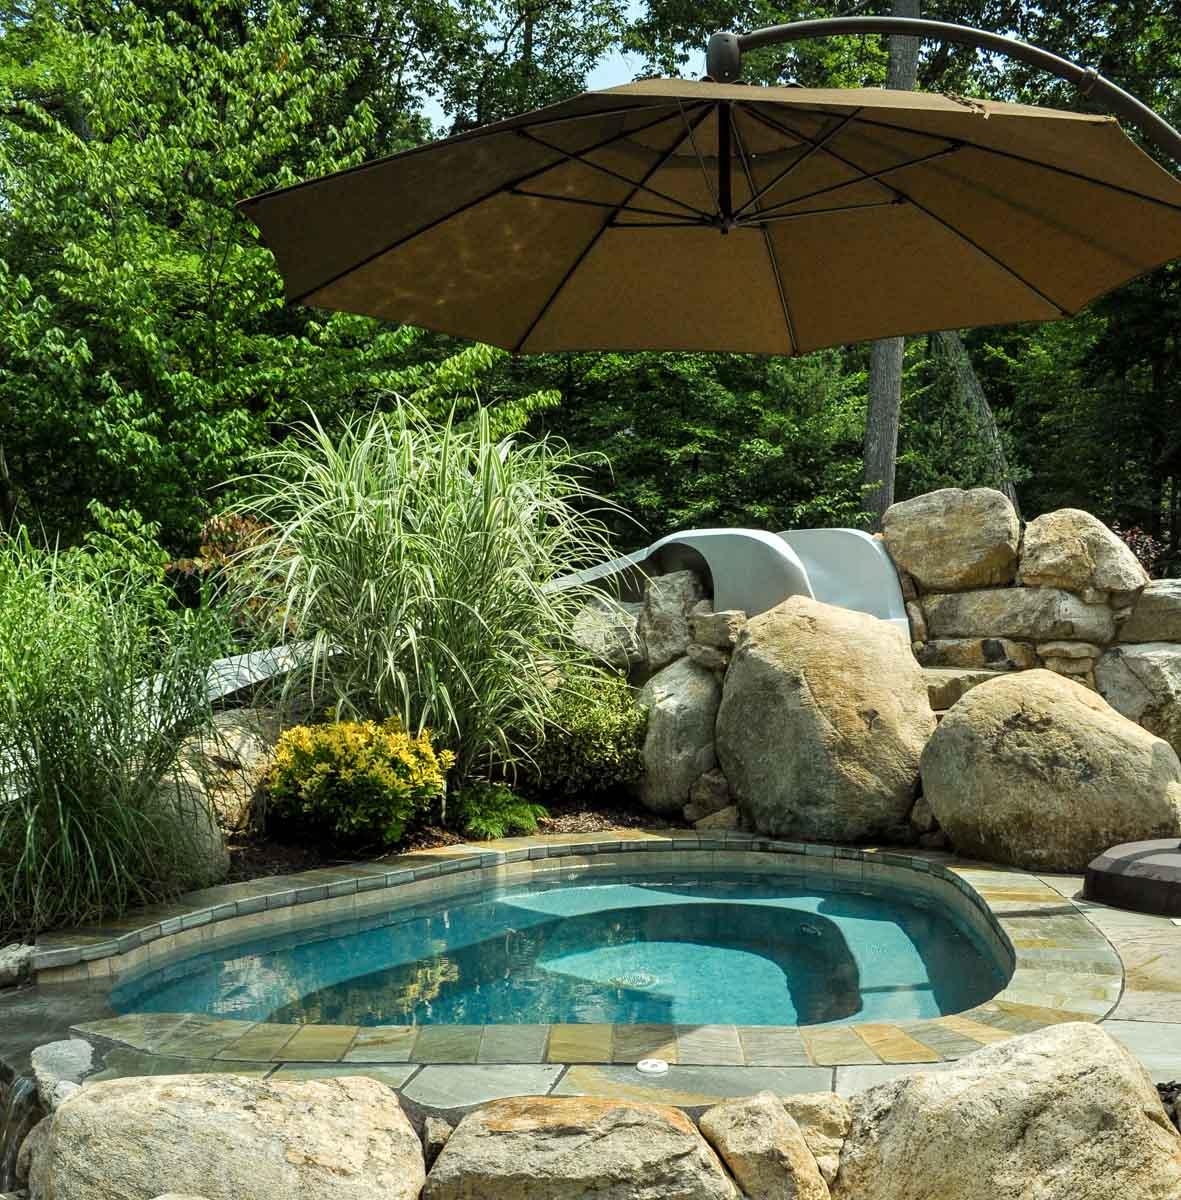 spa with umbrella to provide shade